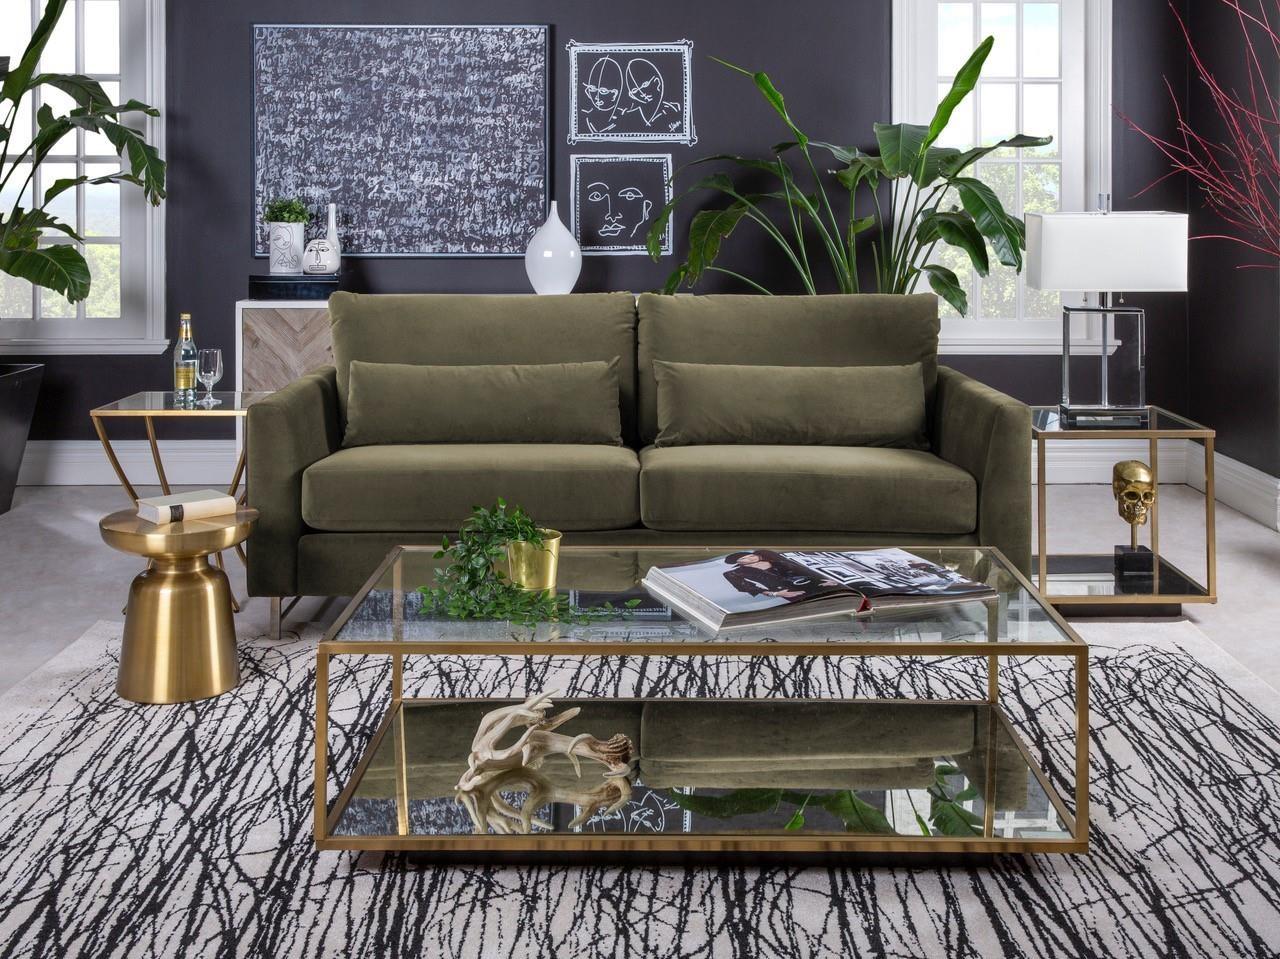 Celine Sofa by Decor-Rest at Stoney Creek Furniture